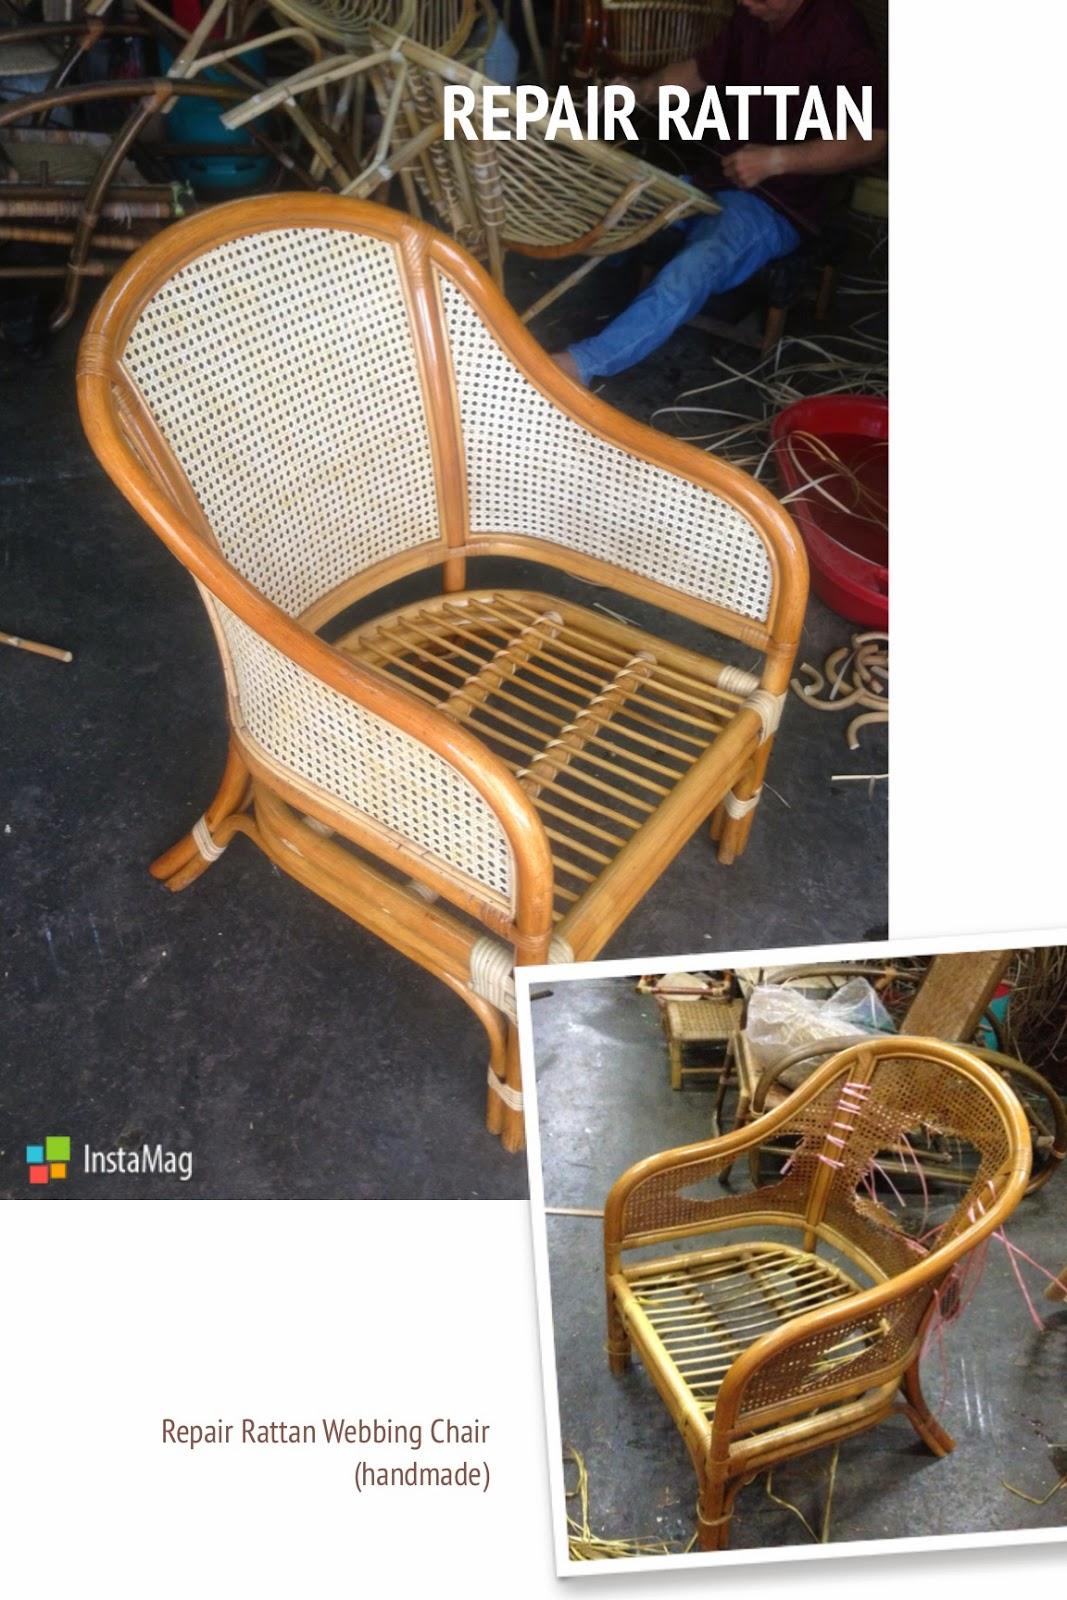 Repair Rattan Furniture Rattan Sofa Cane Wicker Chair Wood Chair In Malaysia